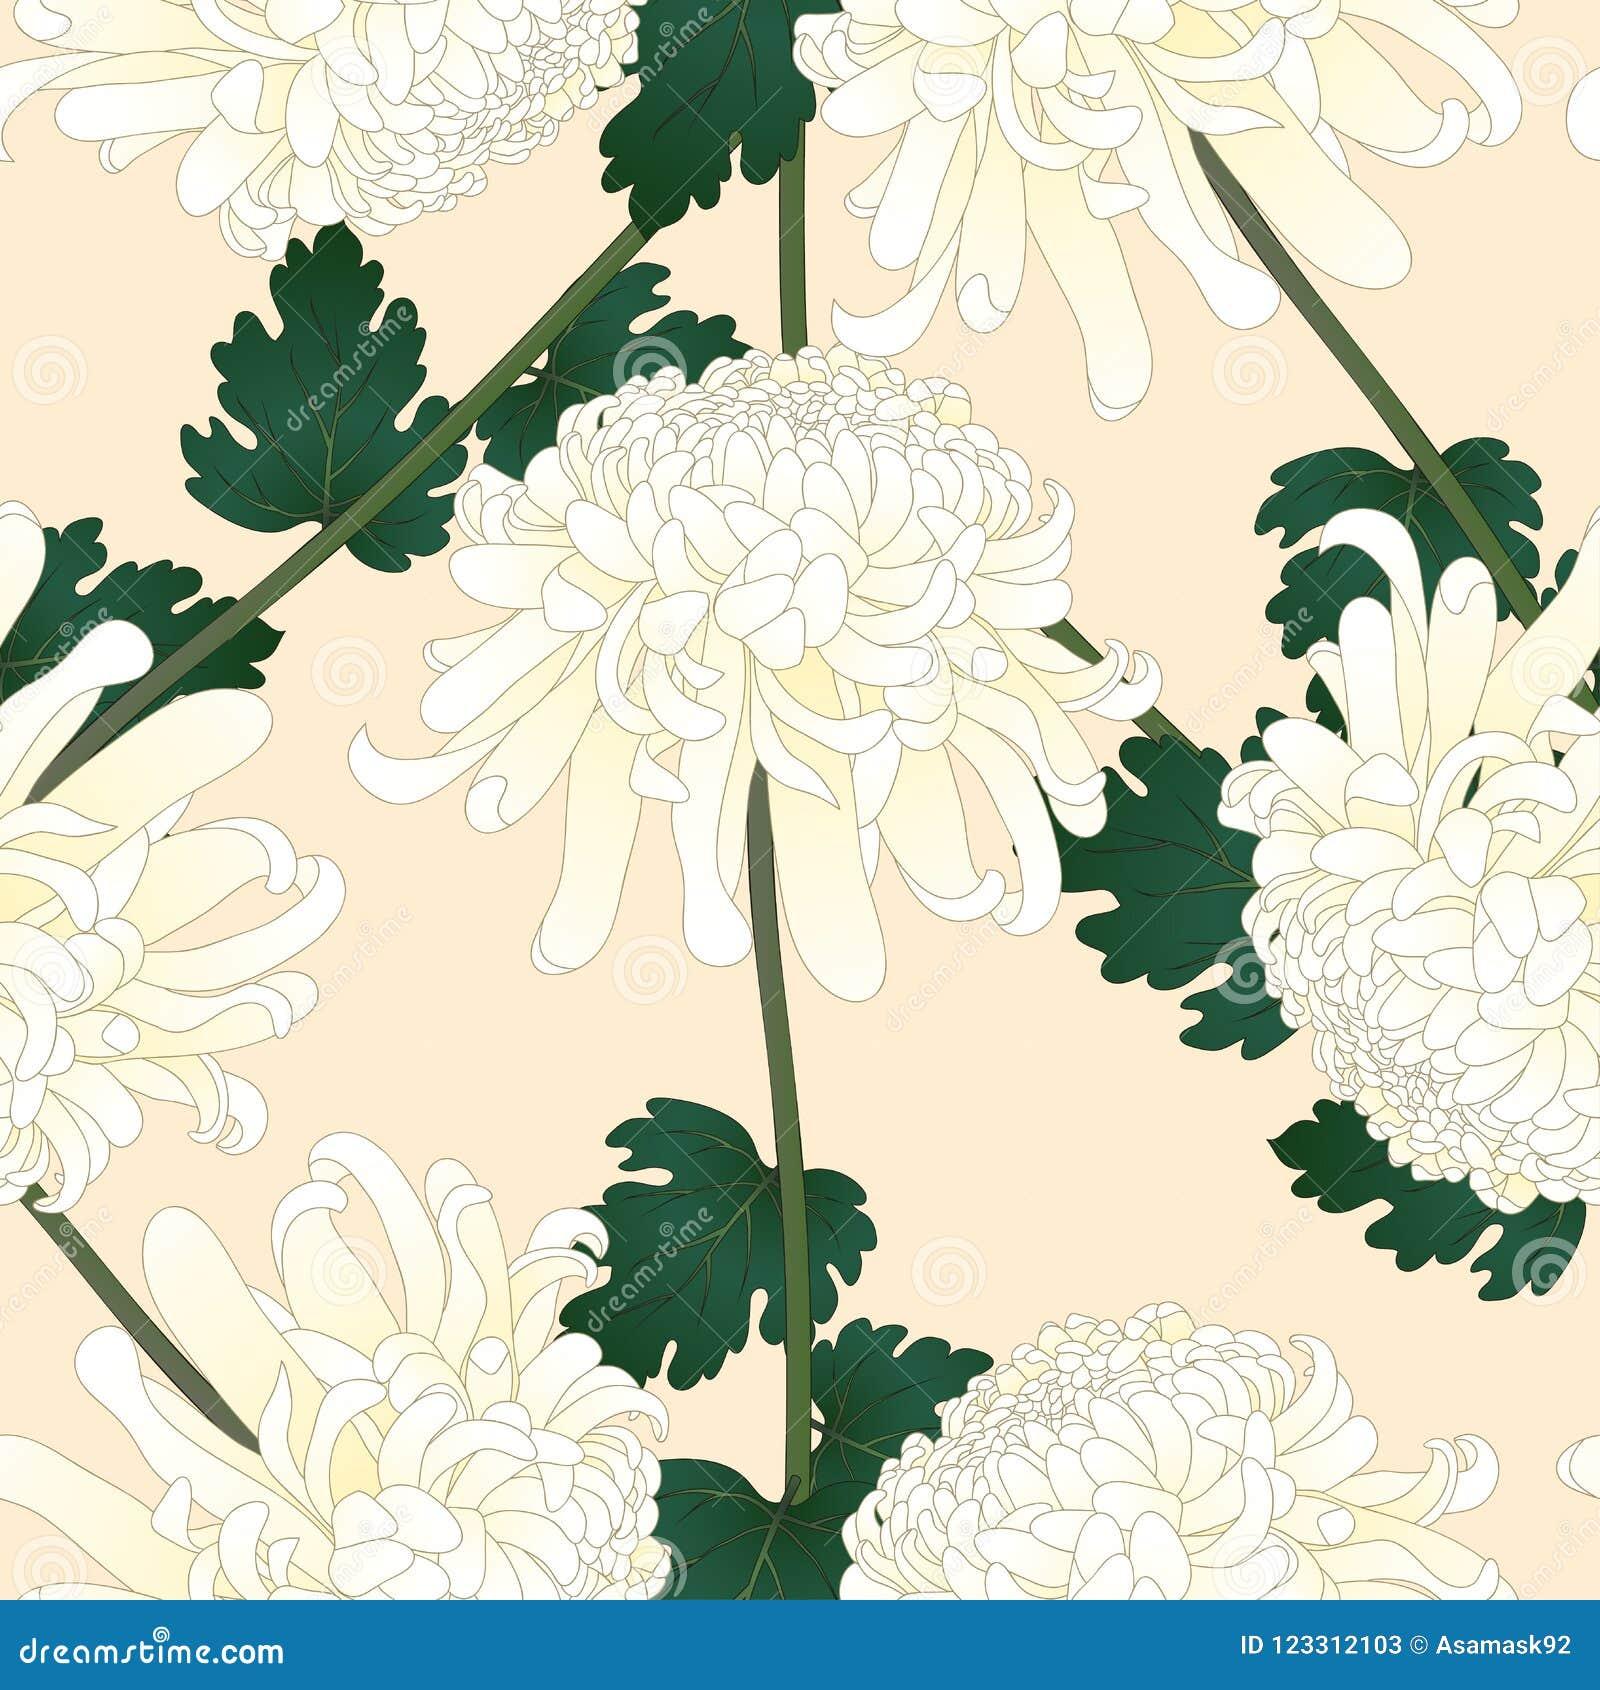 White Chrysanthemum Kiku Japanese Flower On Beige Ivory Background